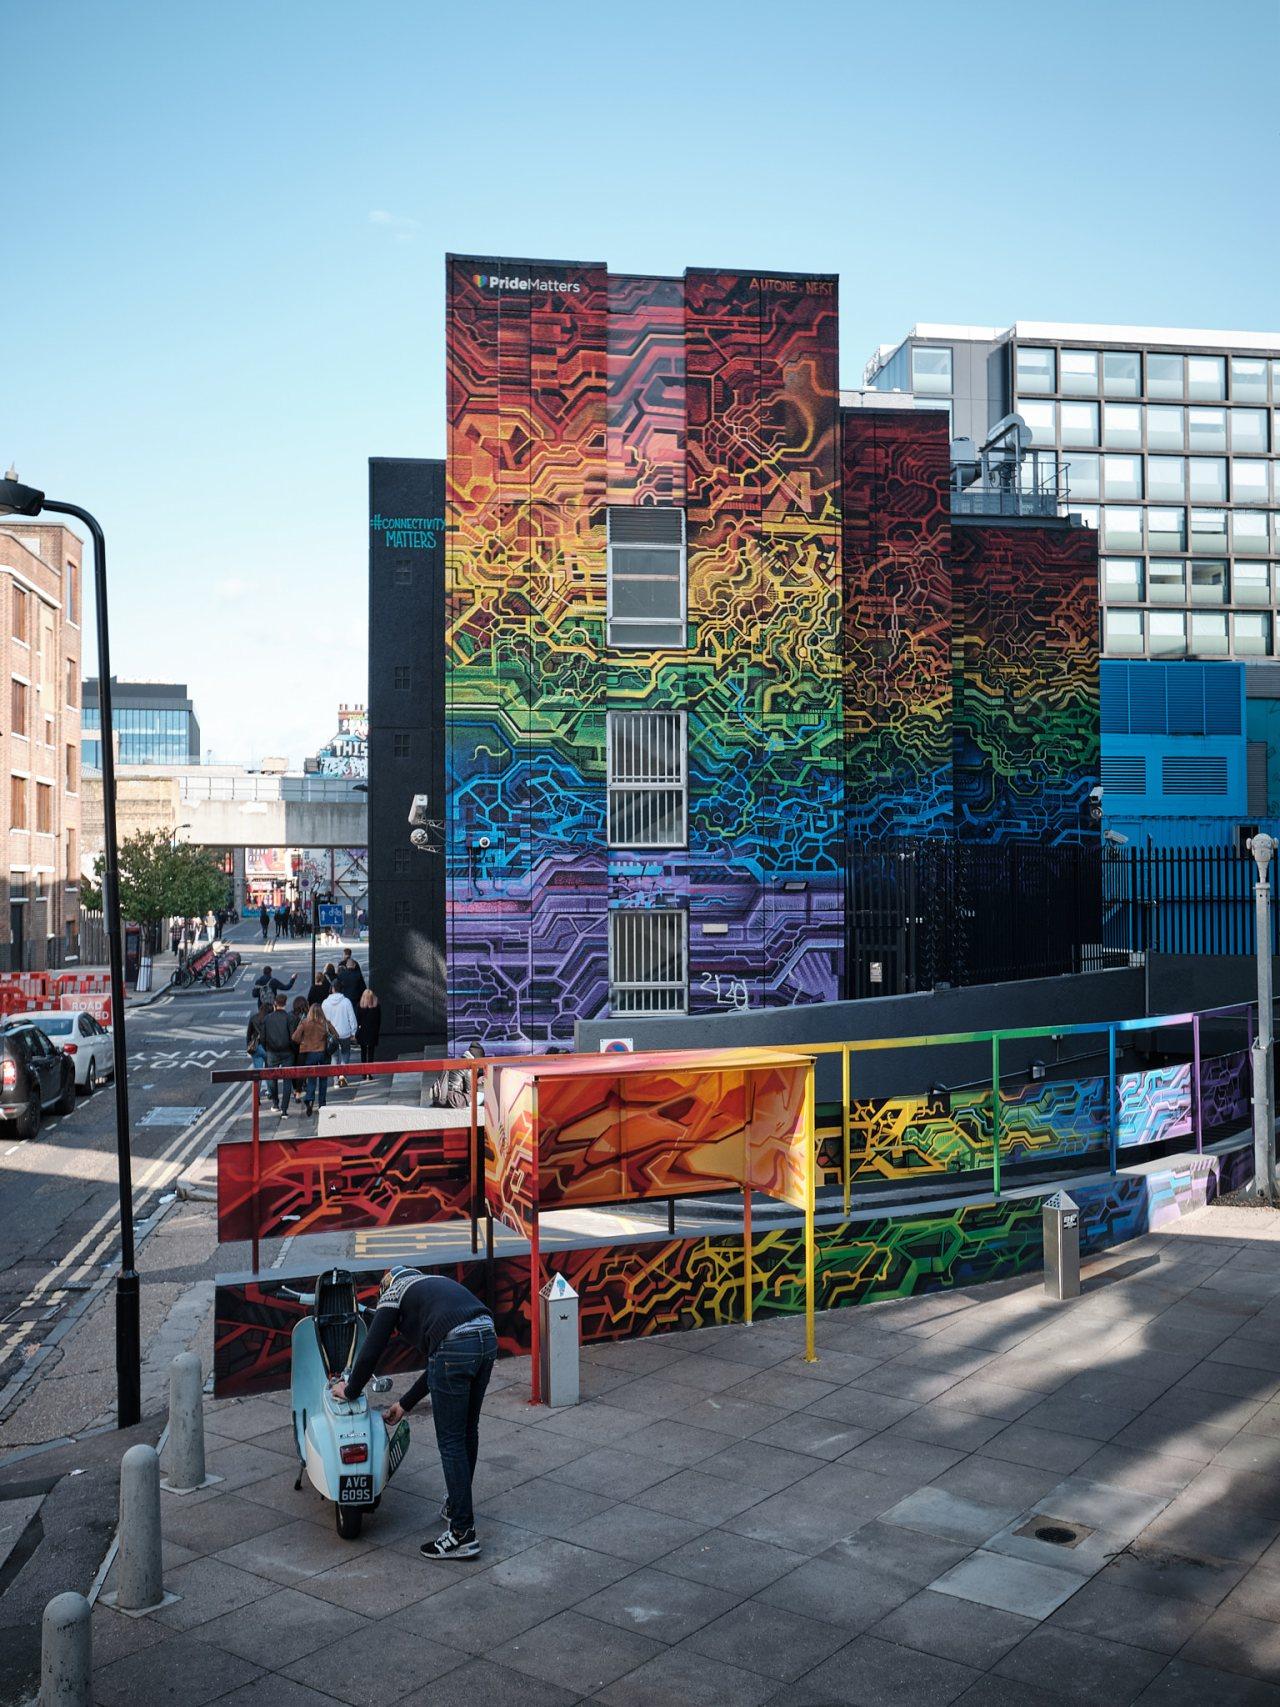 Connectivity Matters - Shoreditch, London